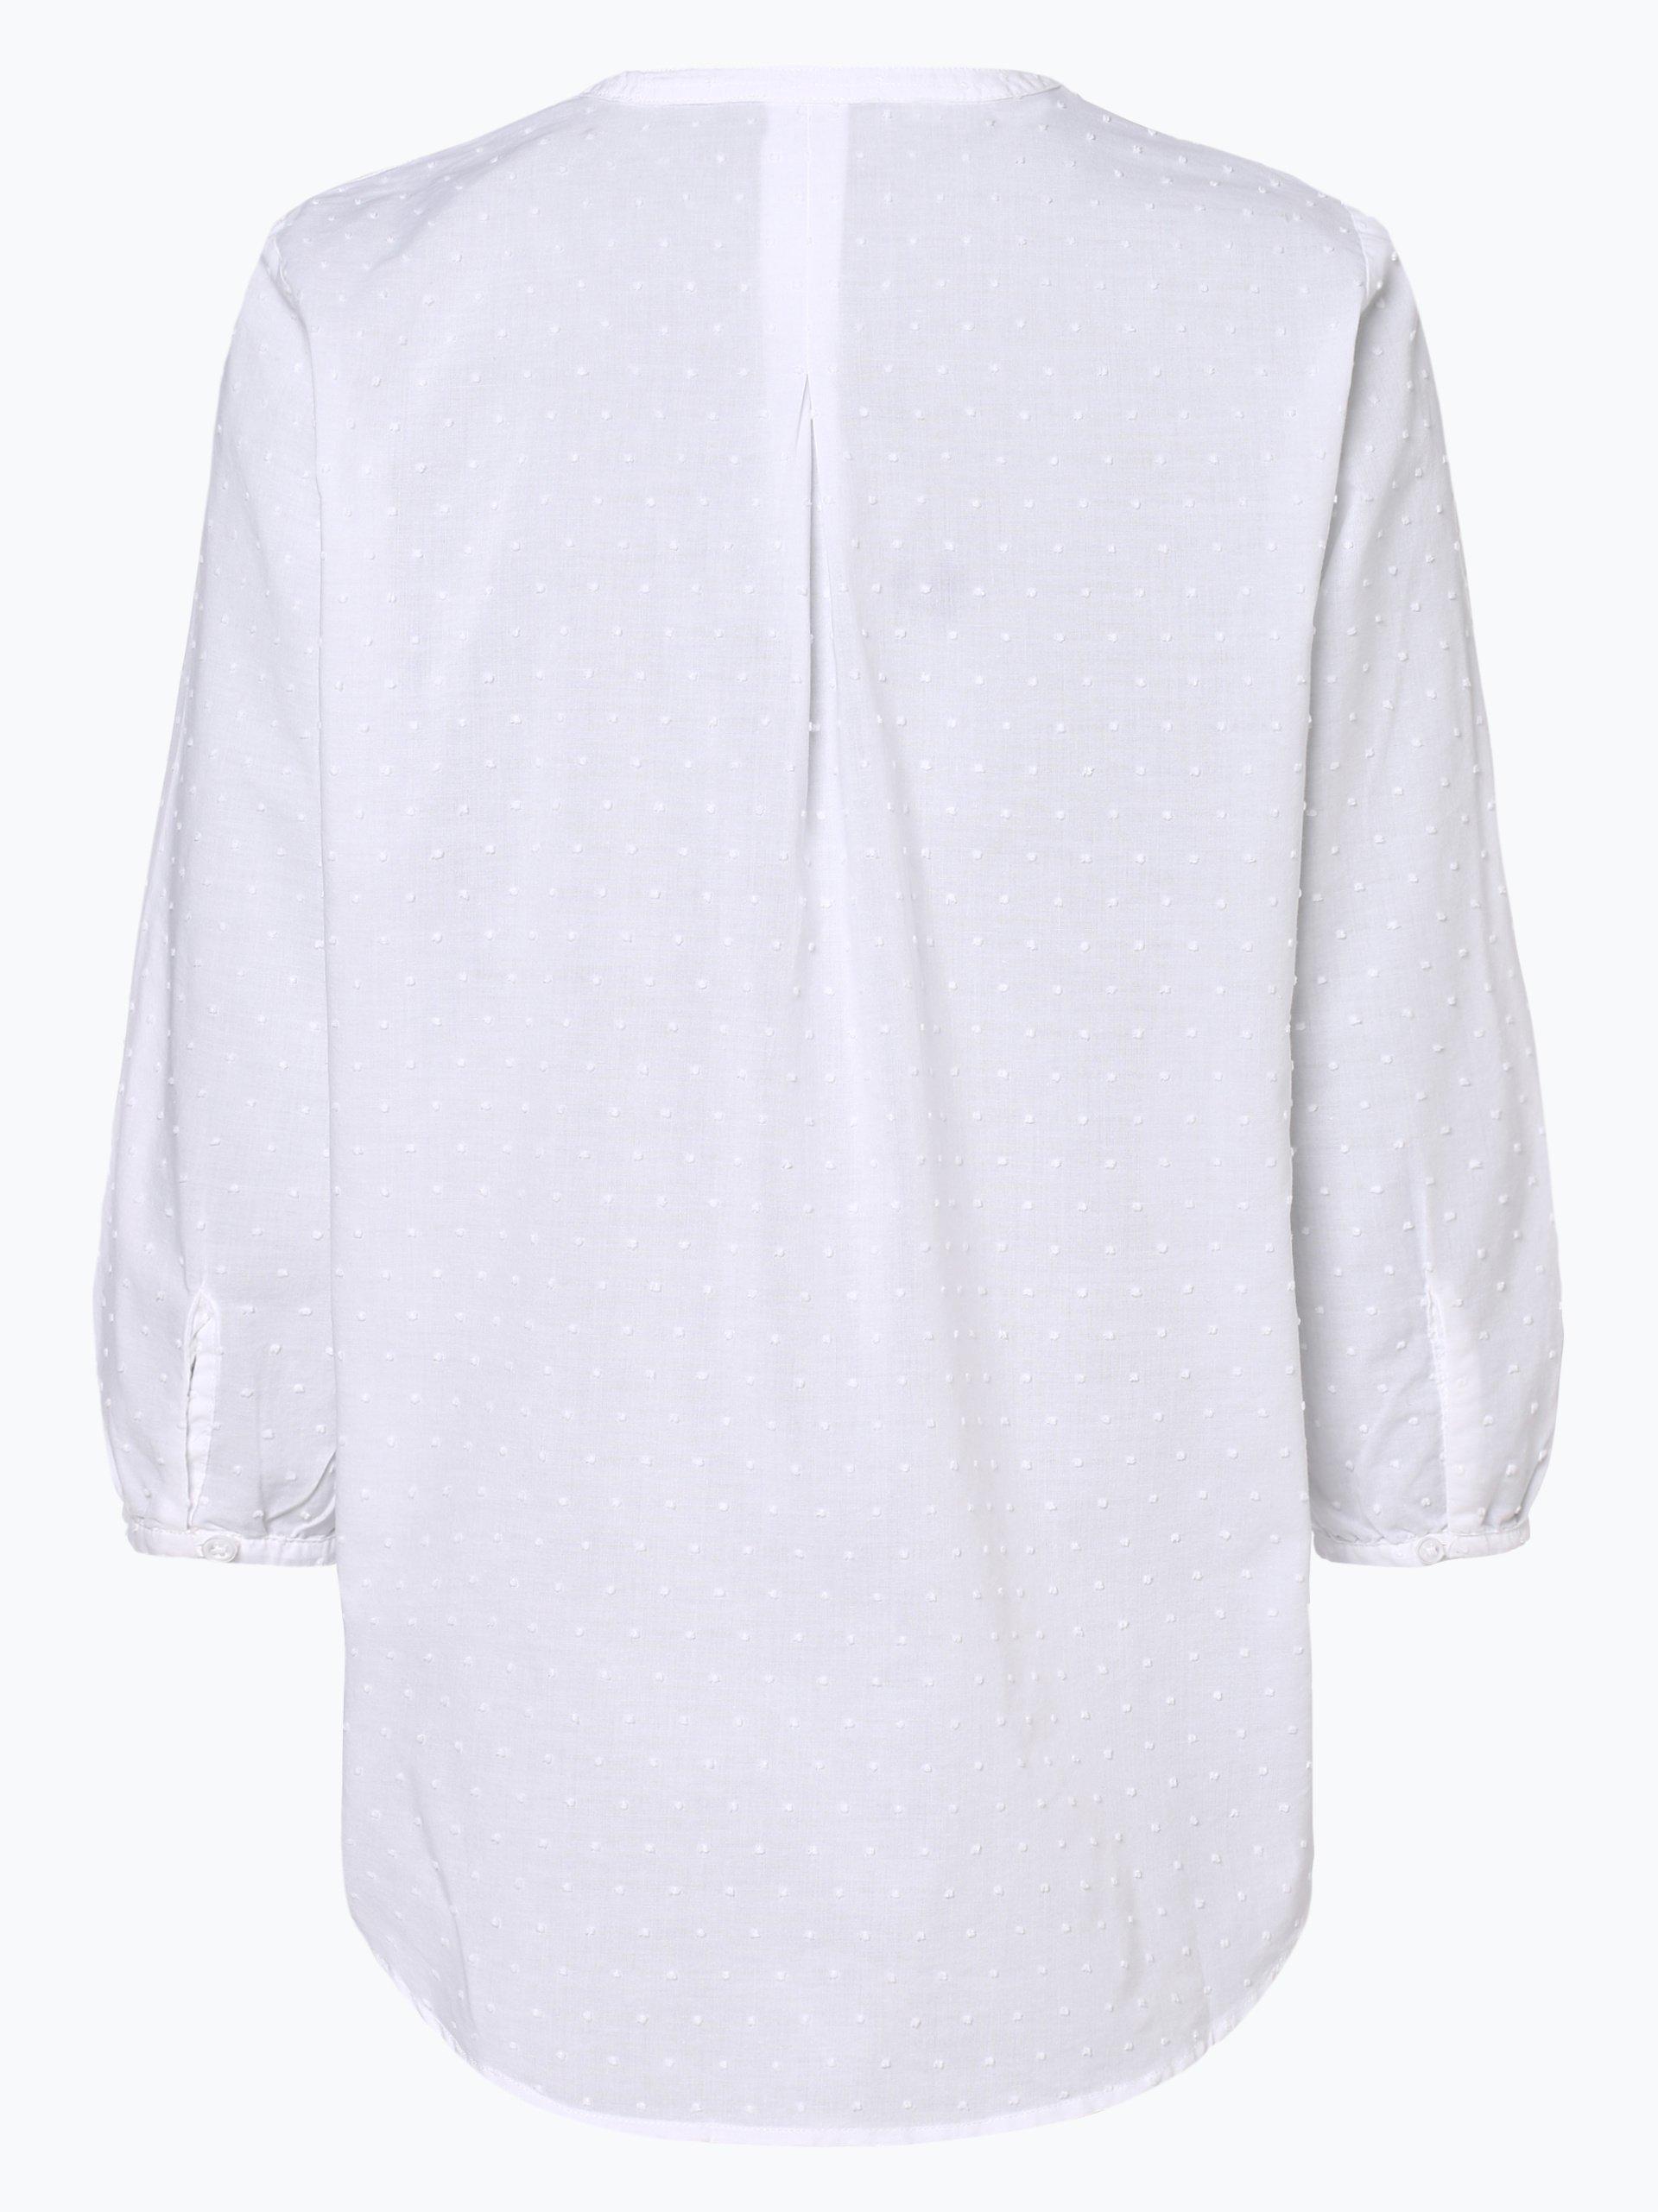 Franco Callegari Damen Bluse